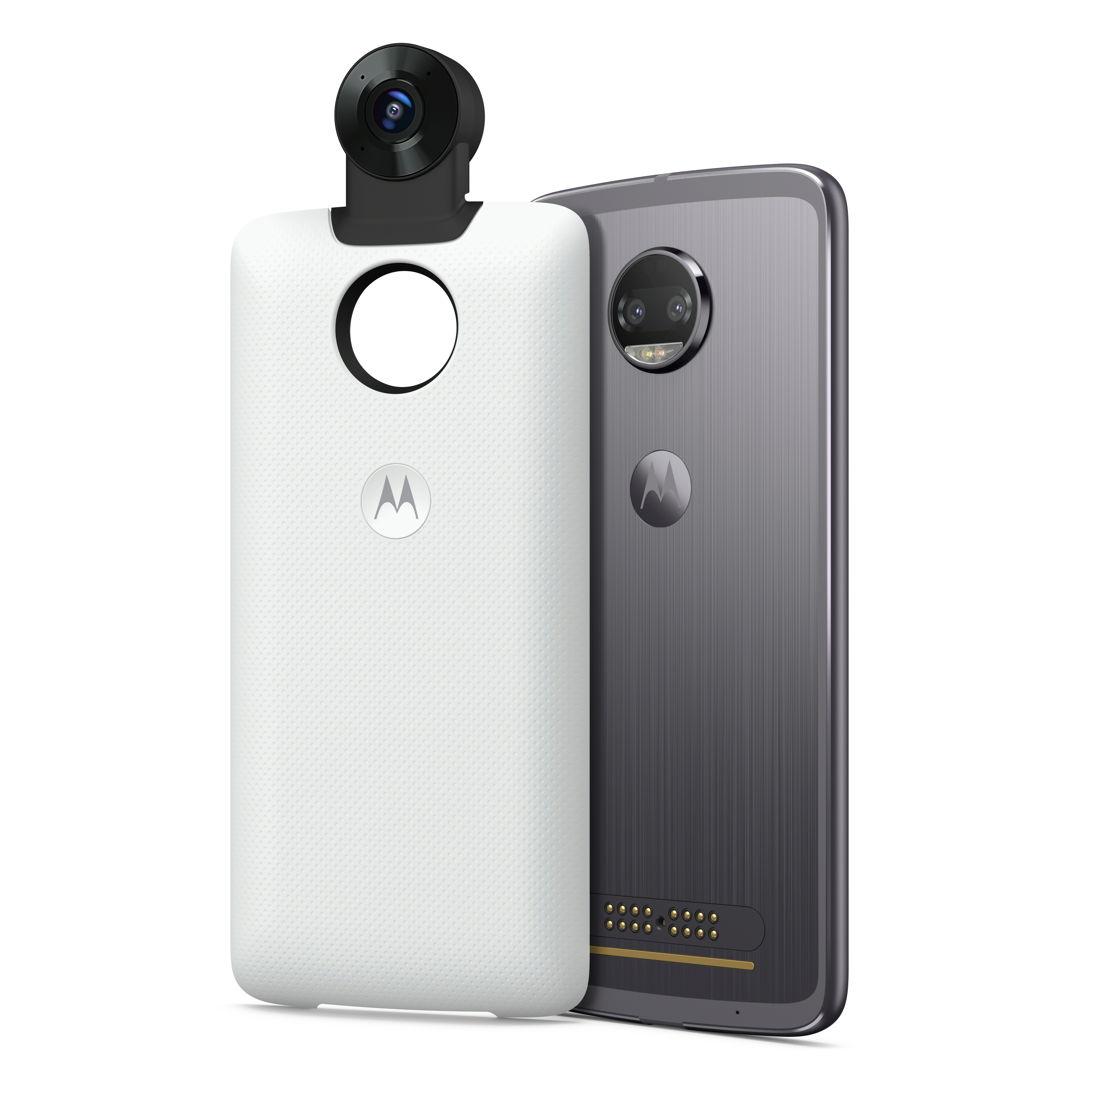 Moto 360° camera